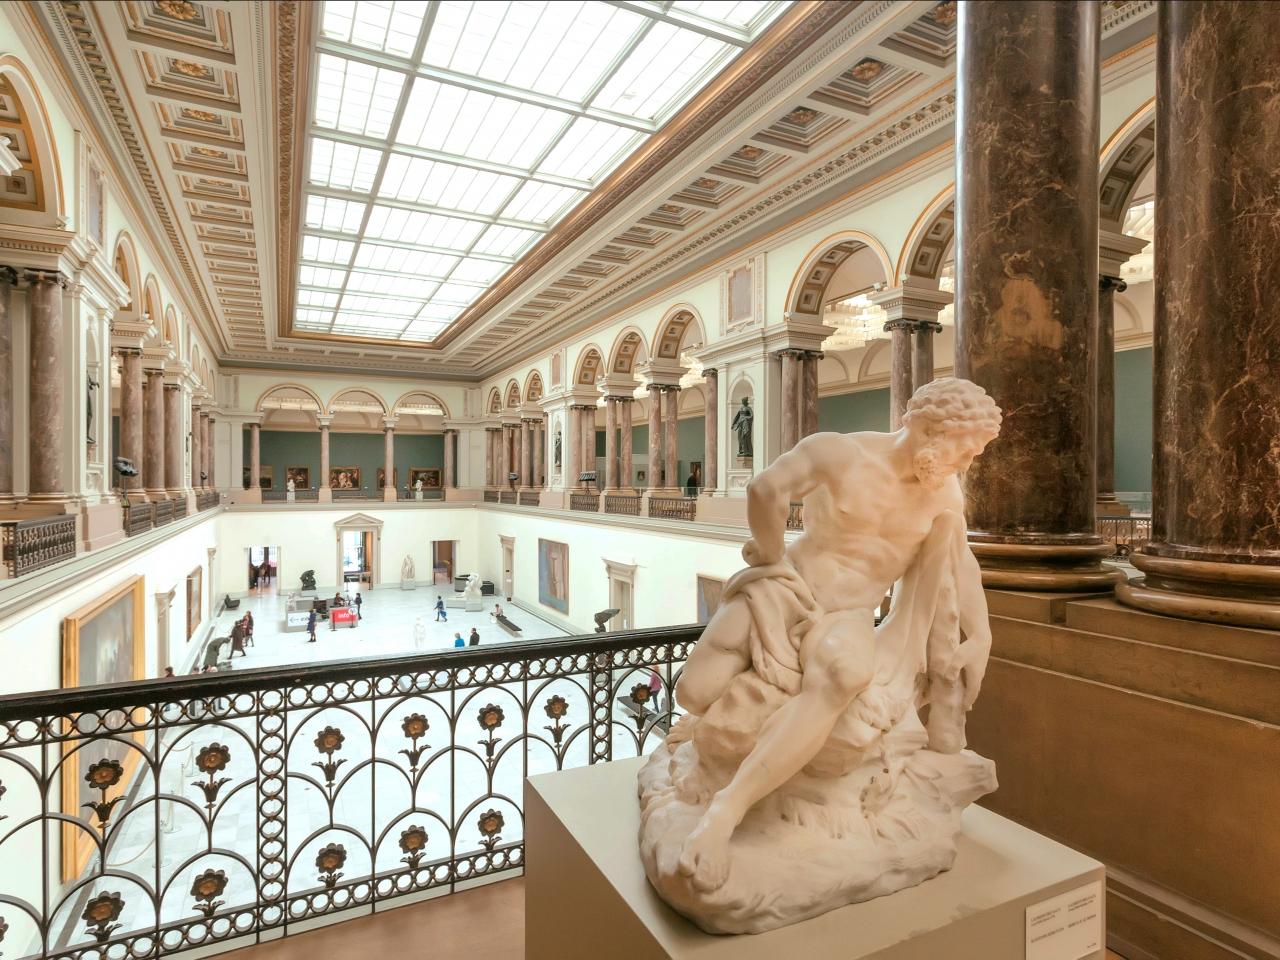 Das Foto zeigt eine Skulptur in den Royal Museums of Fine Arts in Belgien.